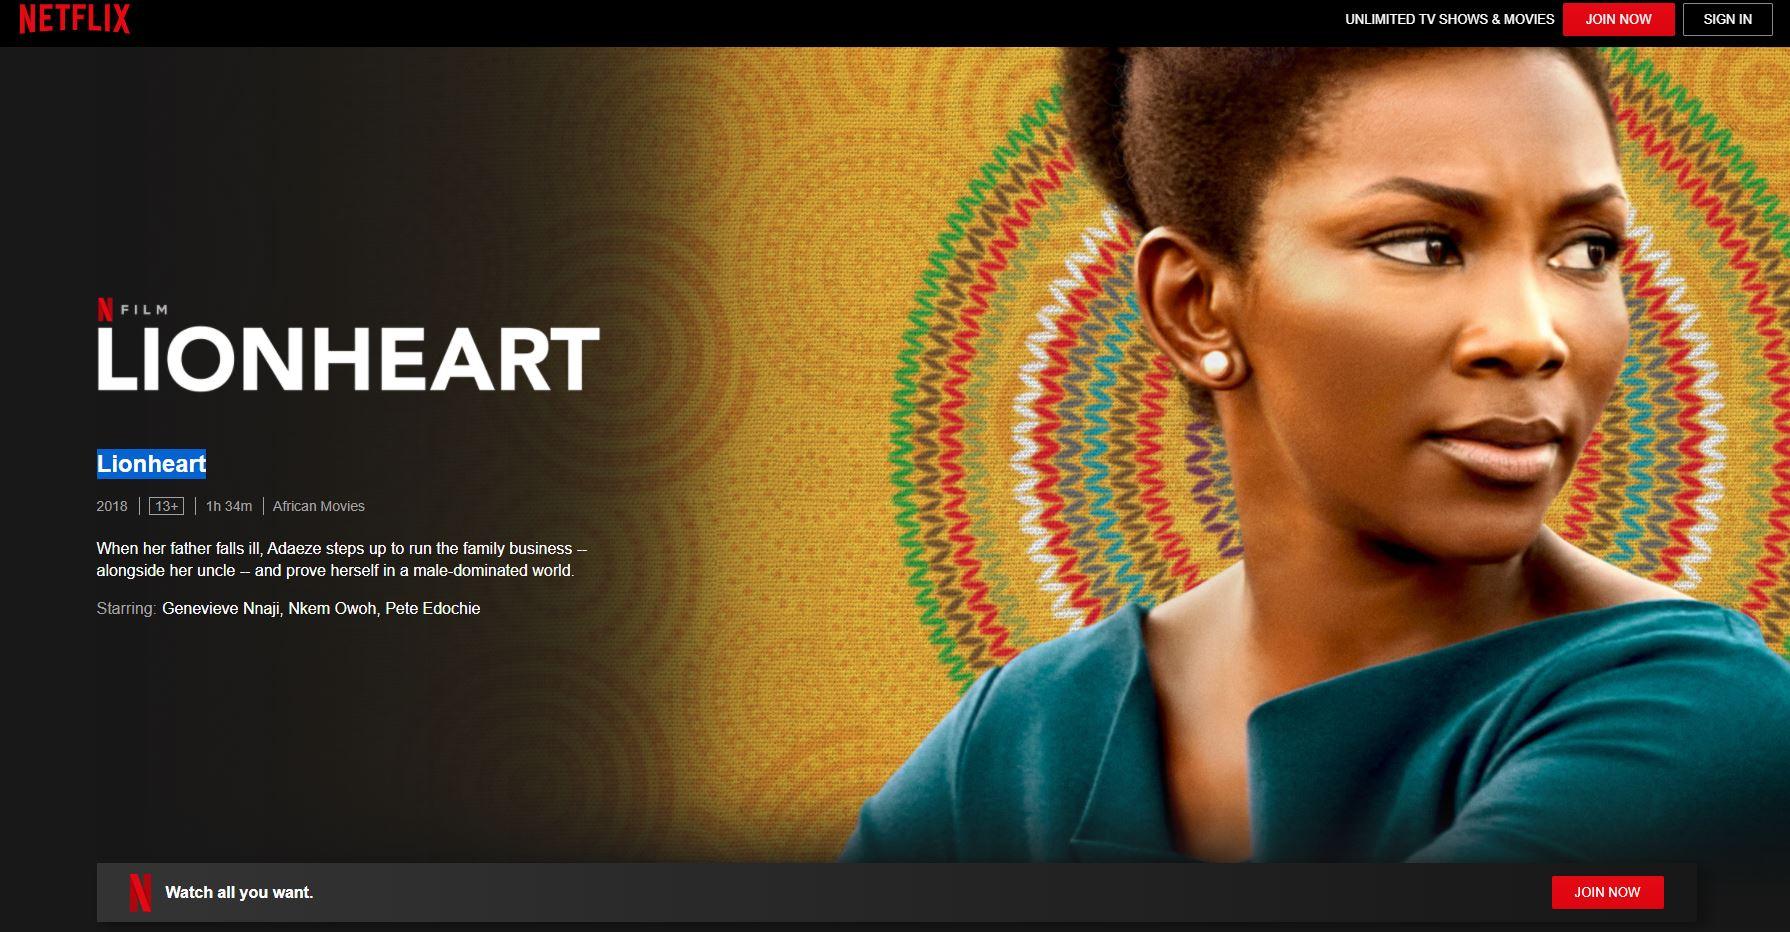 Lionheart Nollywood Movies on Netflix